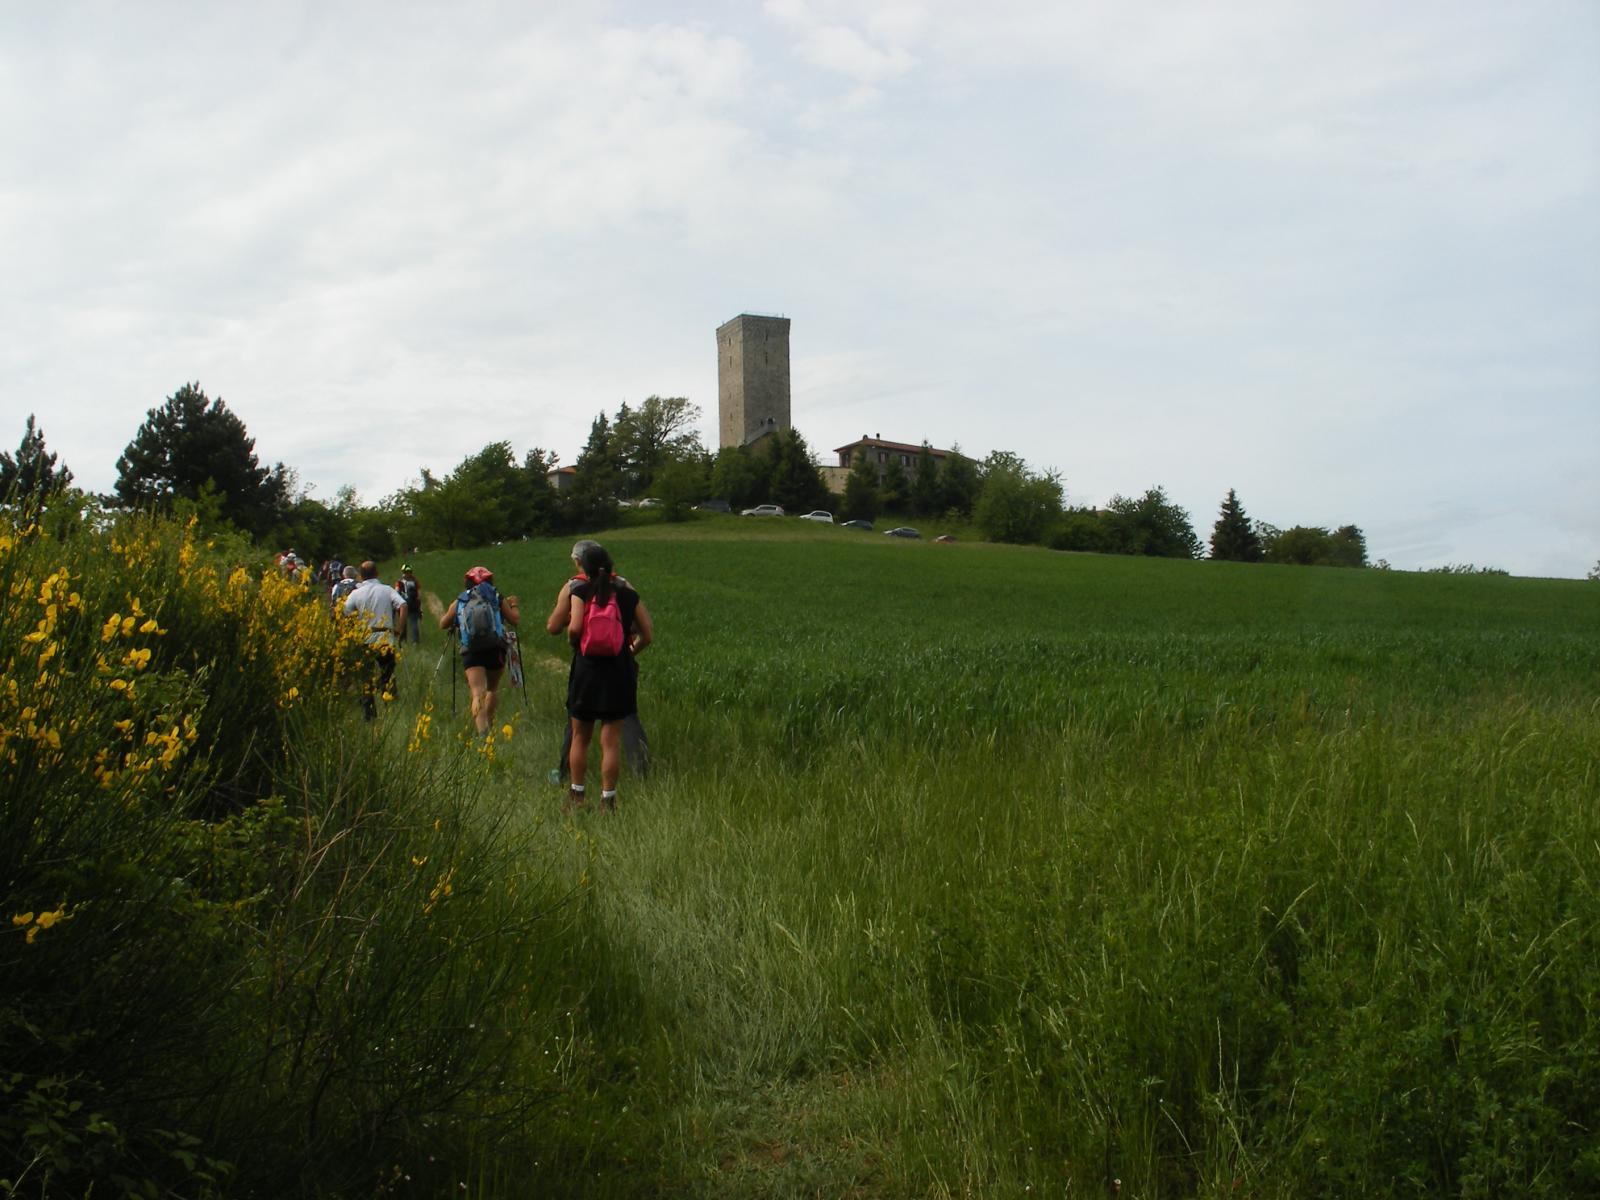 verso San Giorgio Scarampi